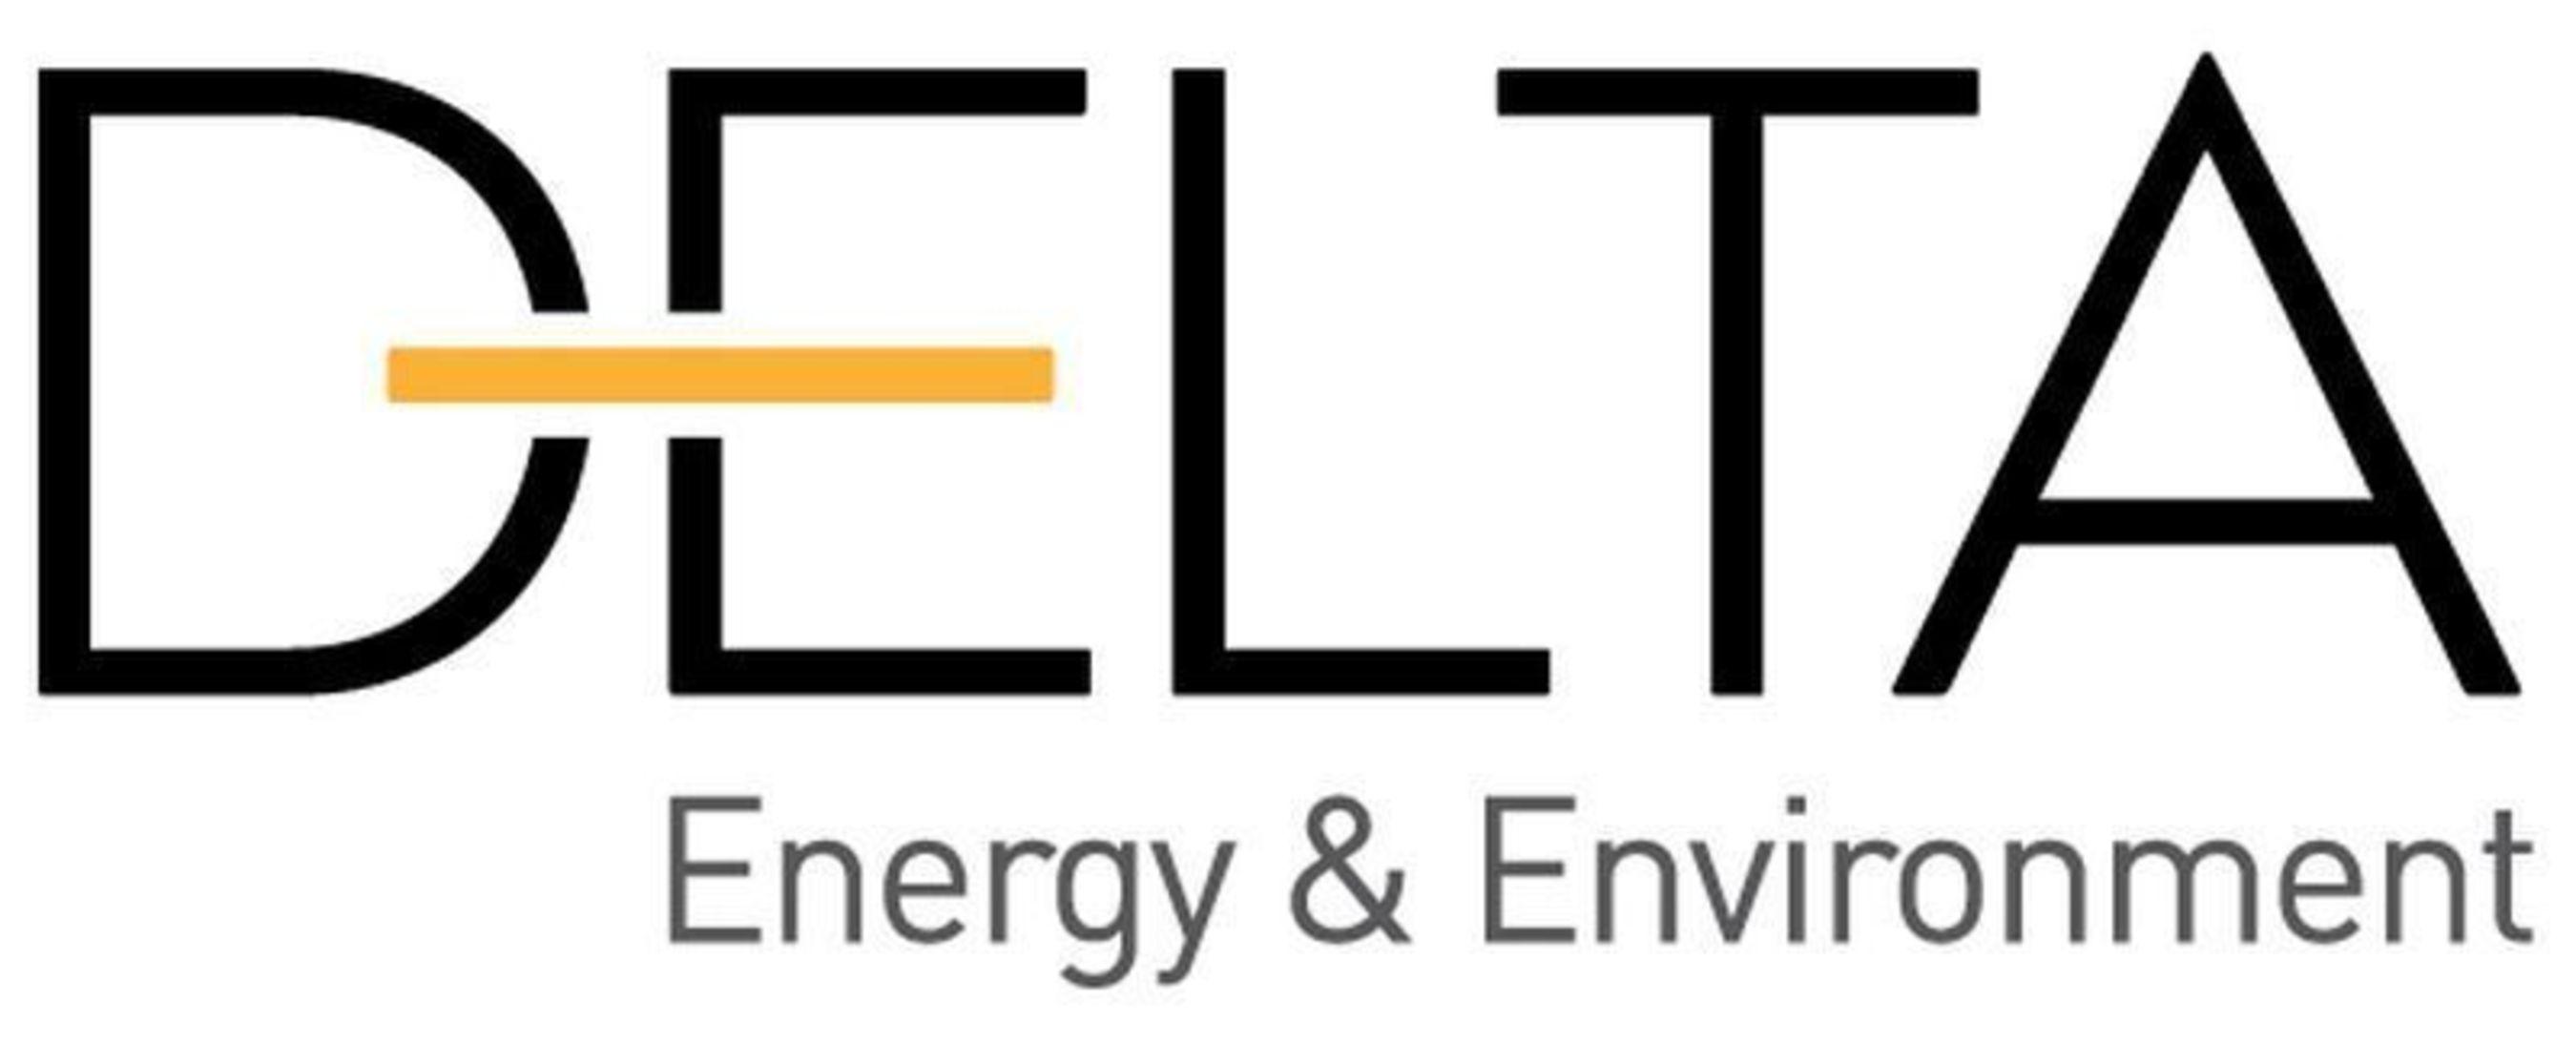 Delta Energy & Environment logo (PRNewsFoto/Delta Energy _ Environment logo)